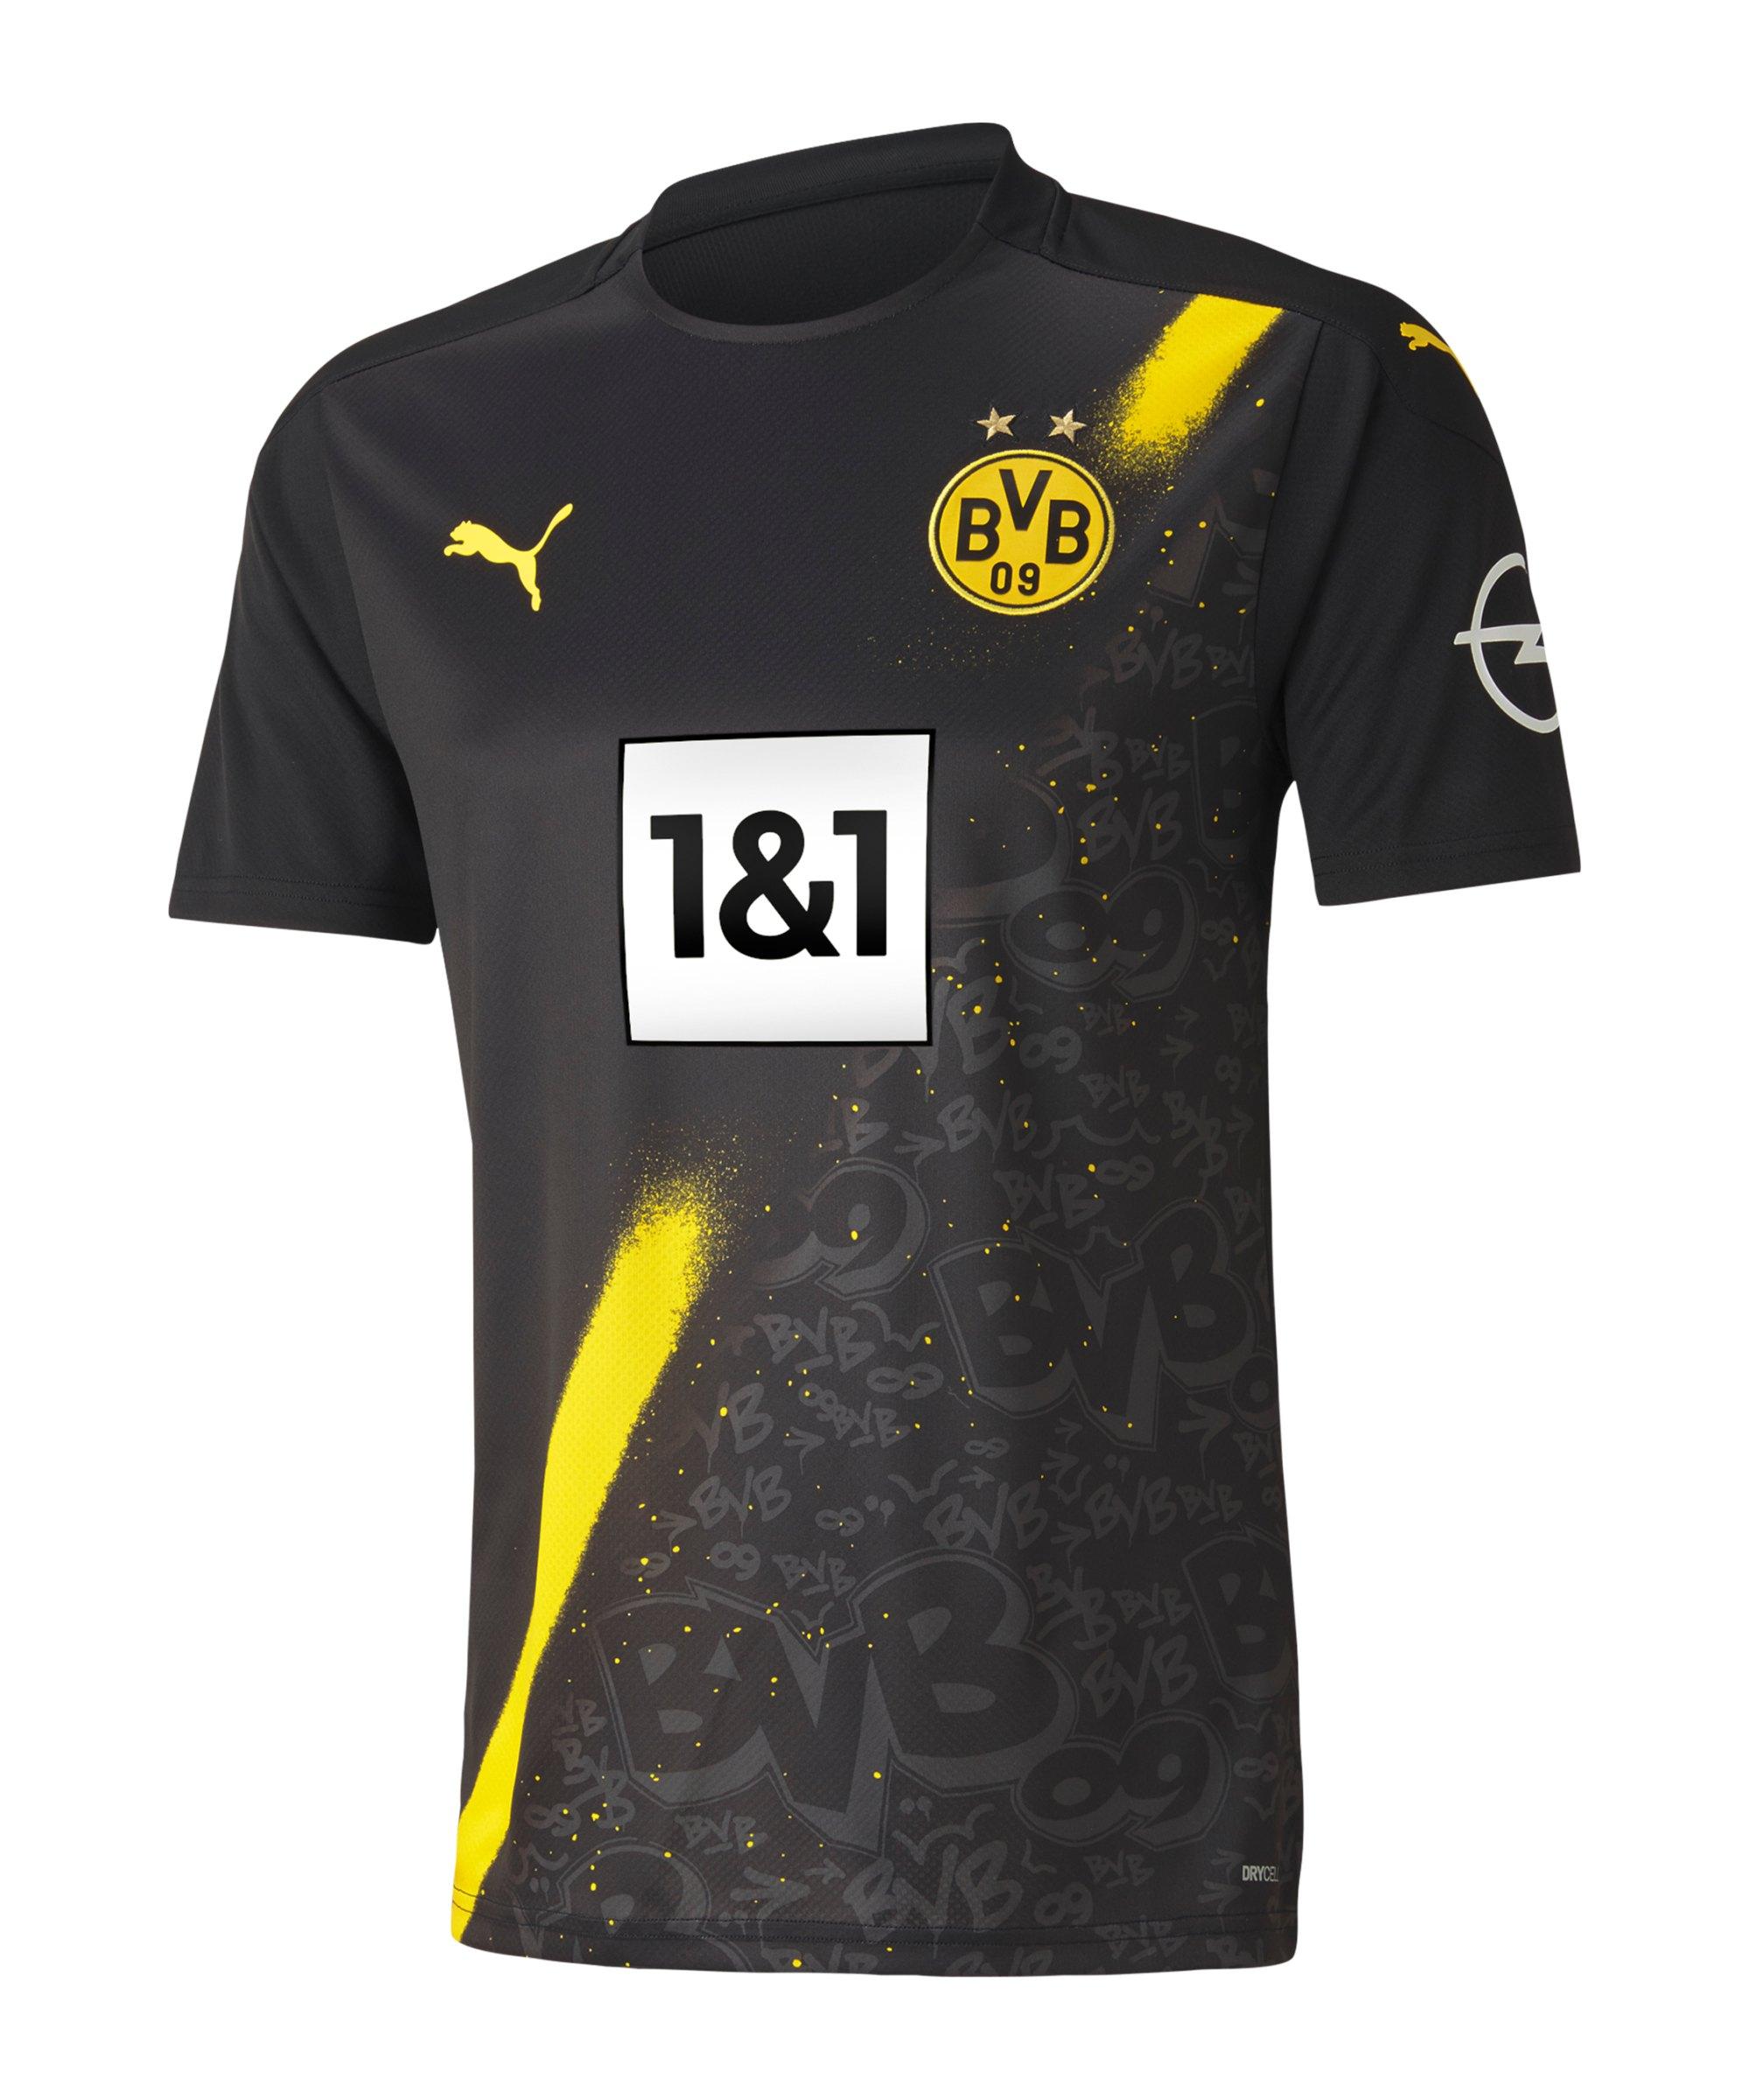 PUMA BVB Dortmund Trikot Away 2020/2021 Schwarz F02 - schwarz